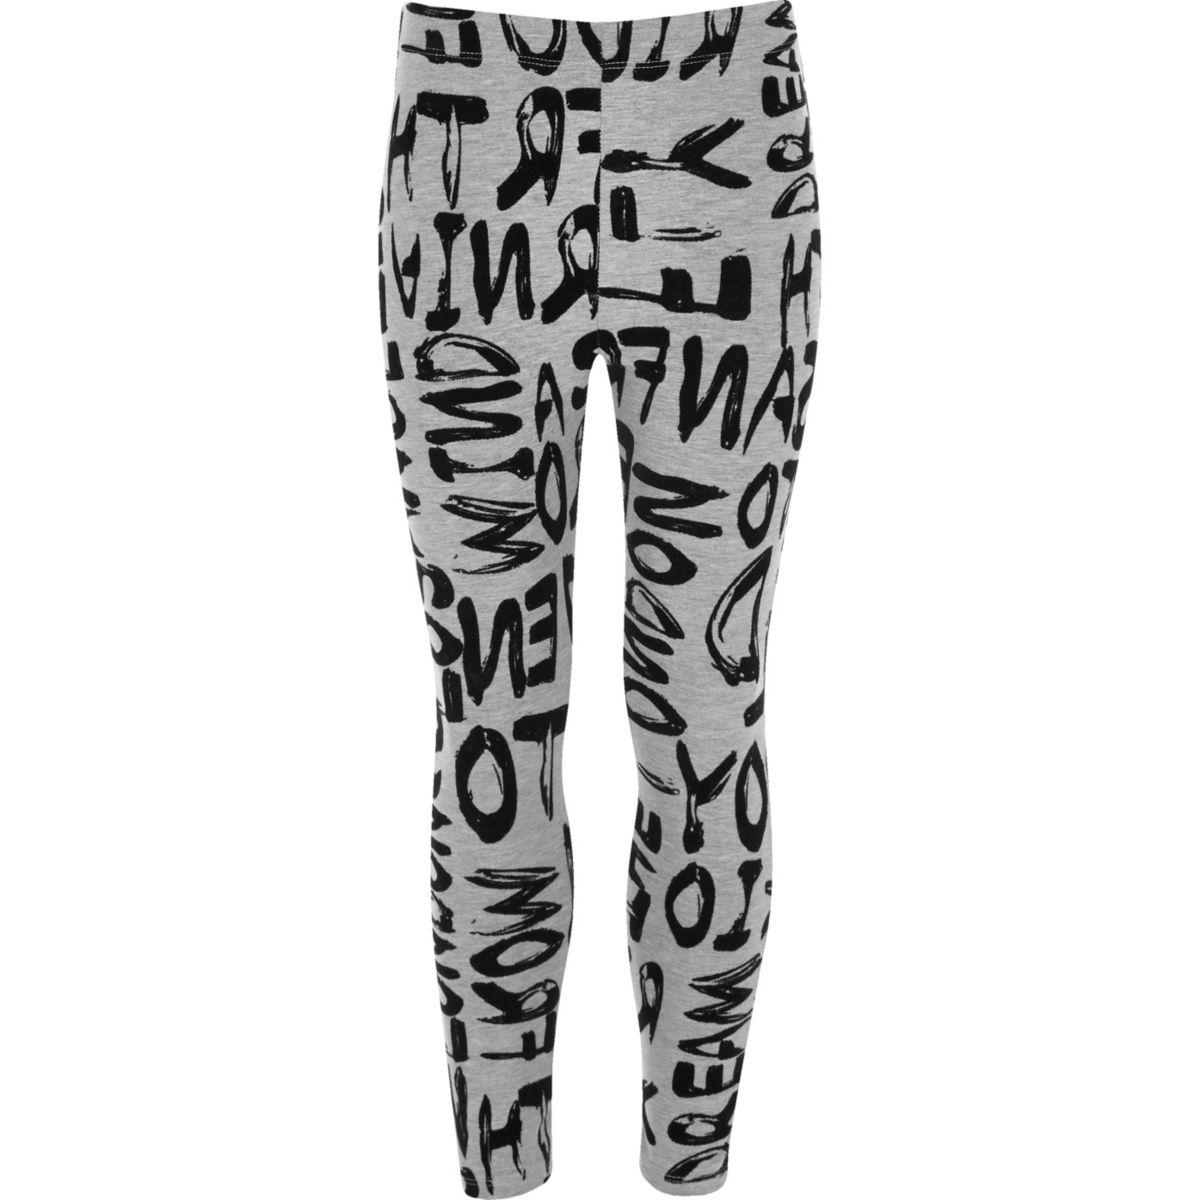 Girls grey flocked graffiti print leggings